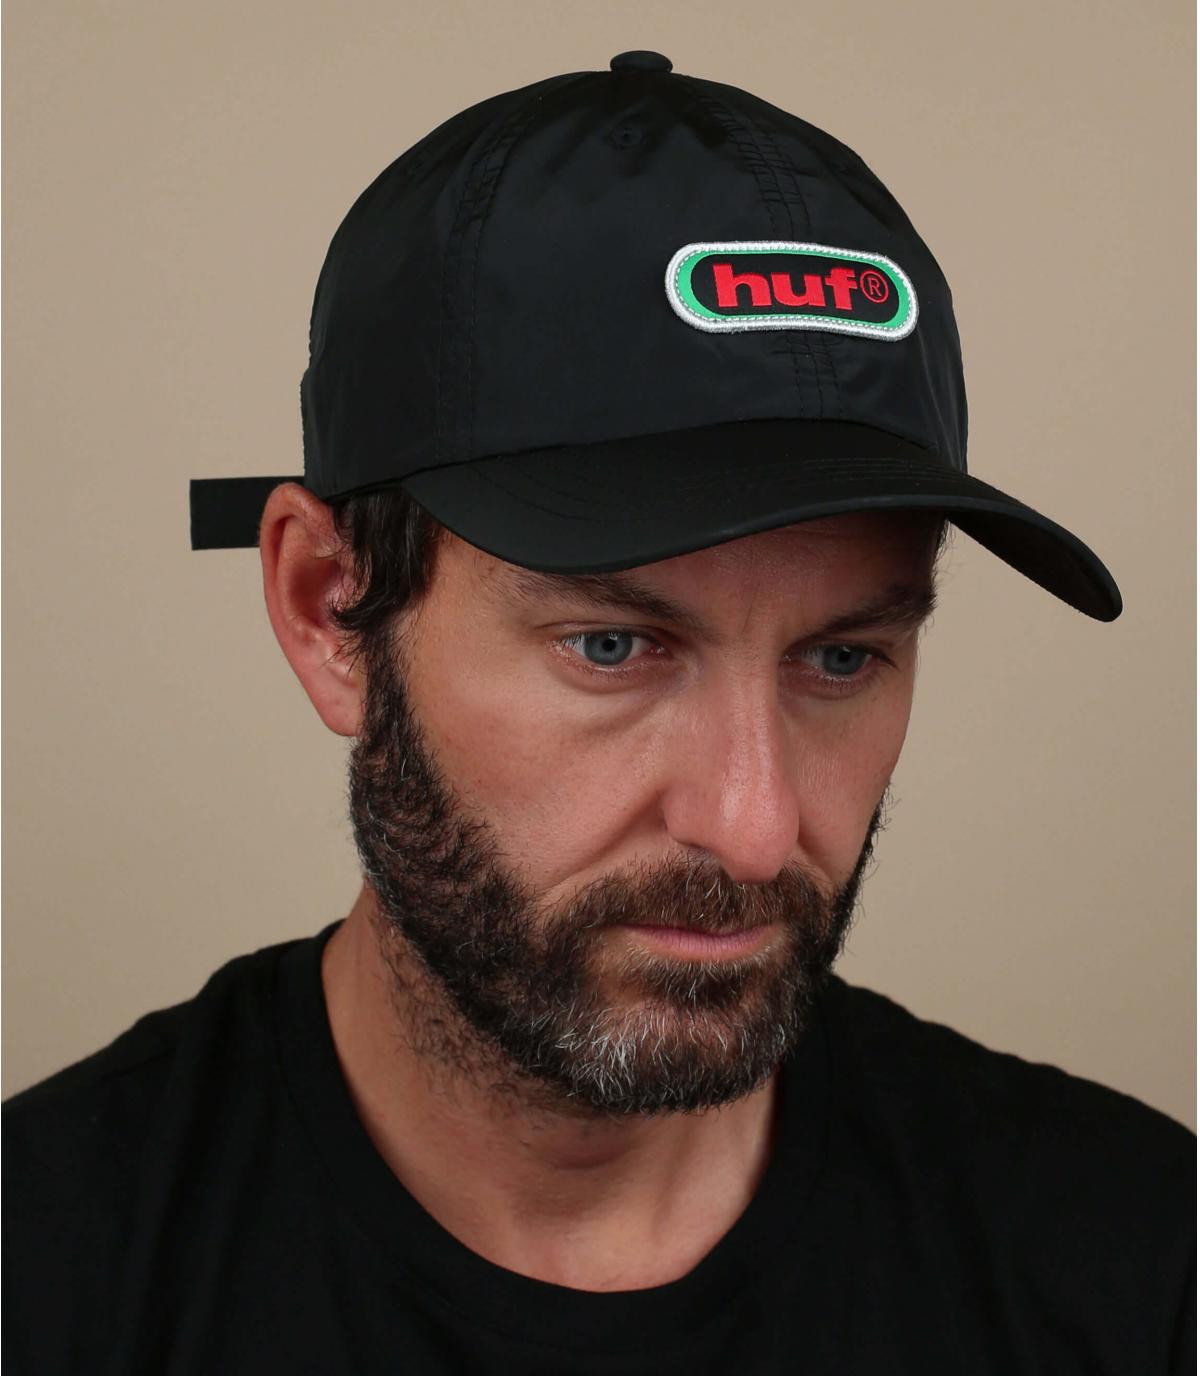 Huf black cap '90s